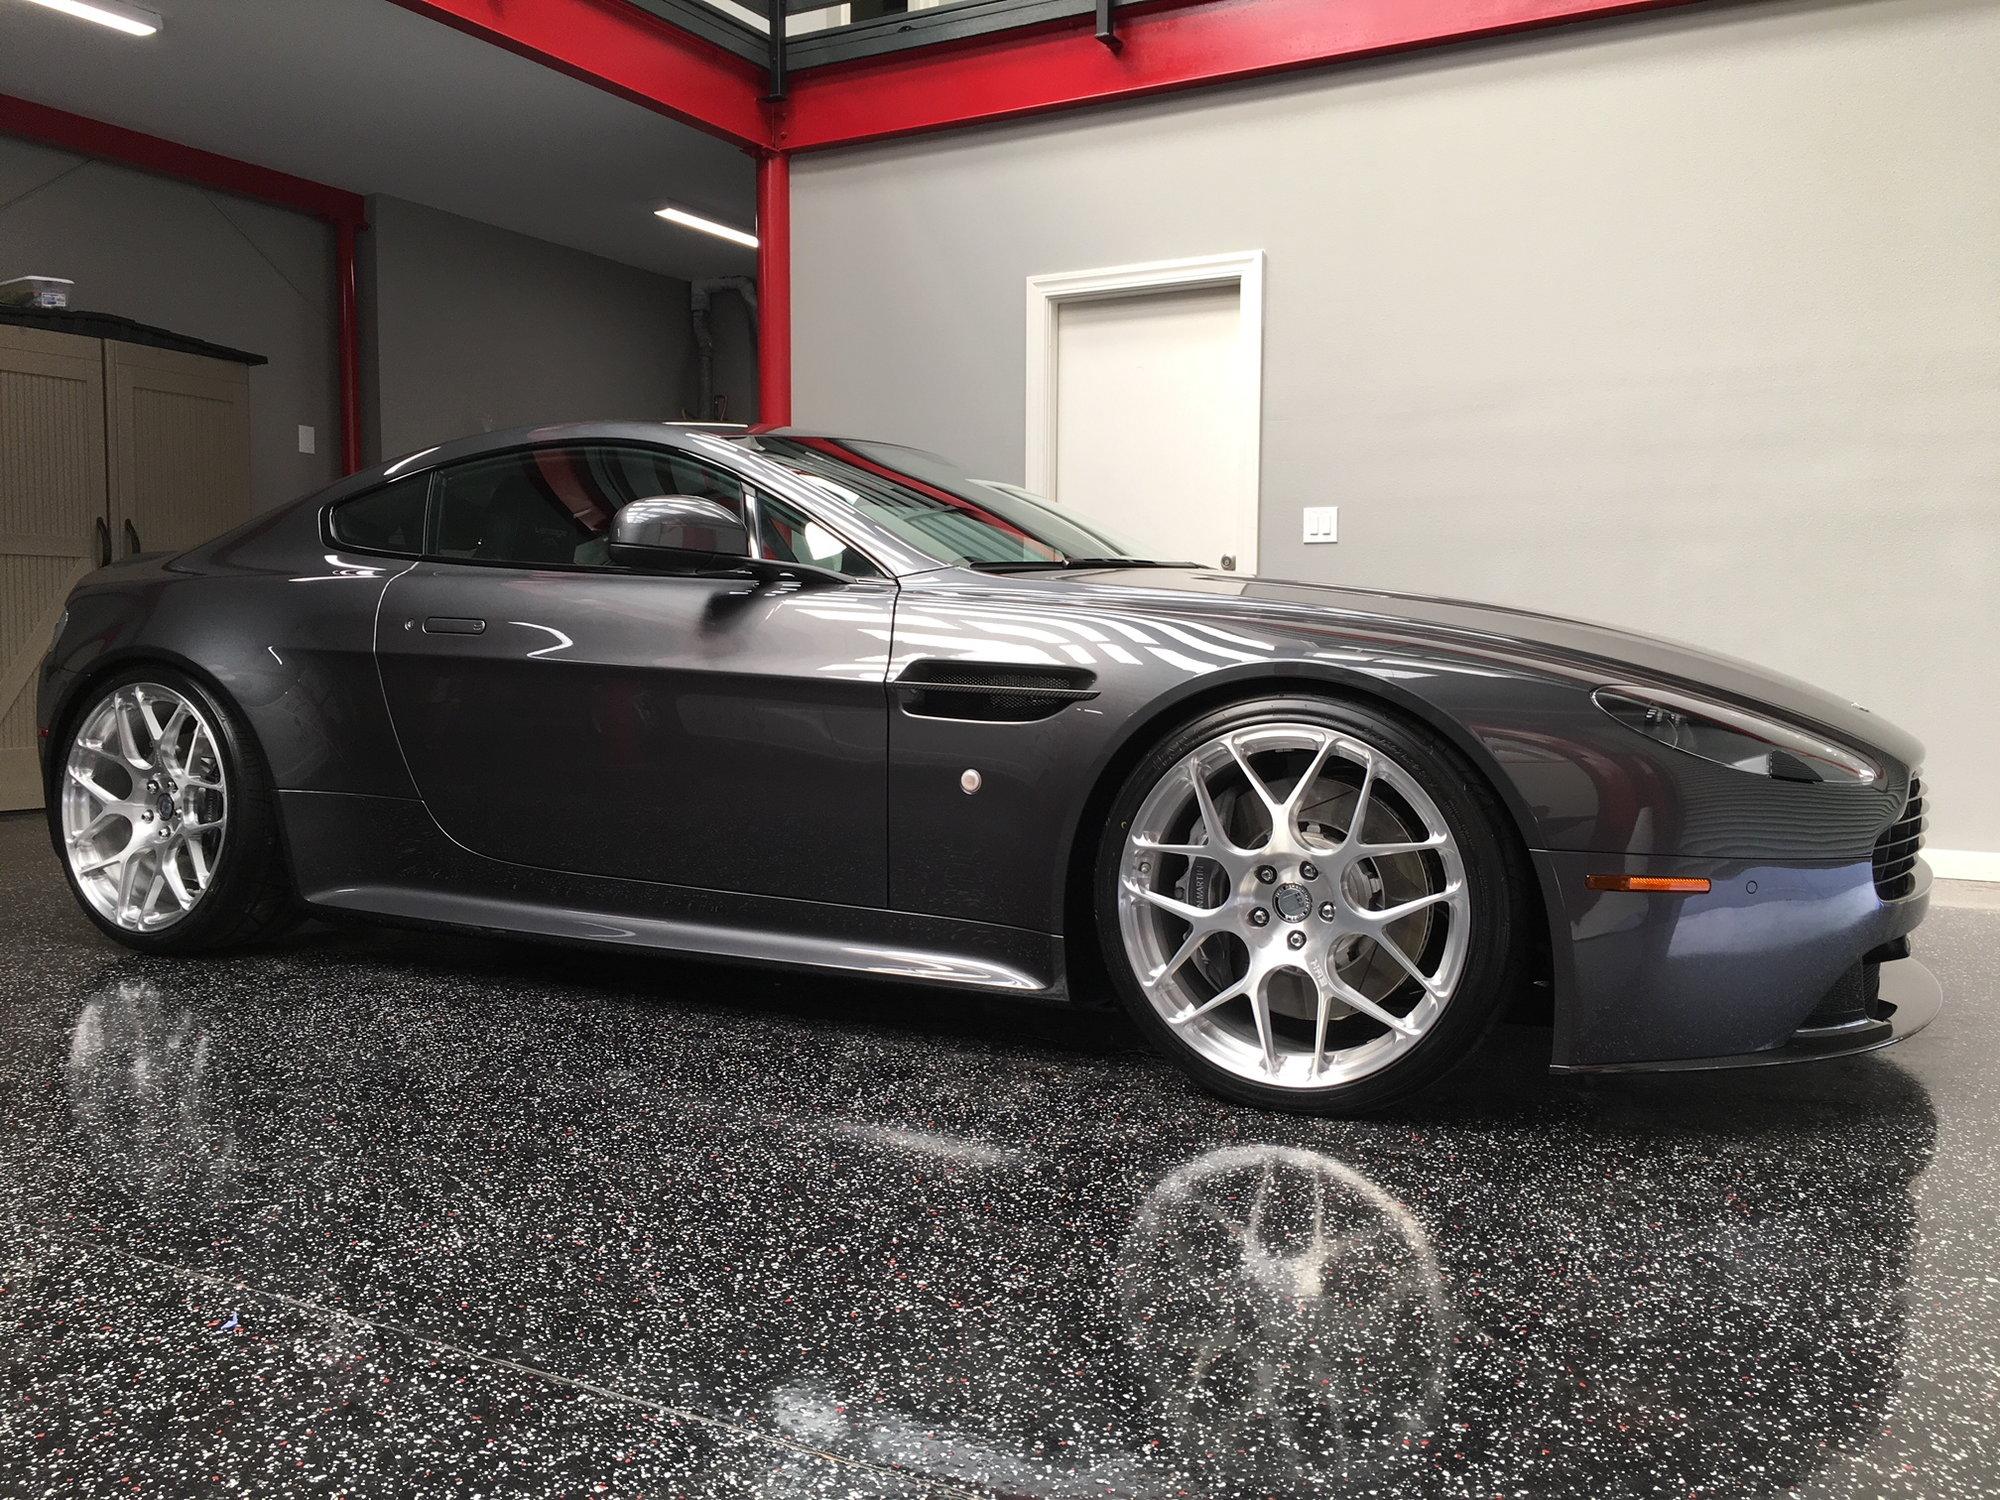 Best Looking Wheels On Vantage 6speedonline Porsche Forum And Luxury Car Resource